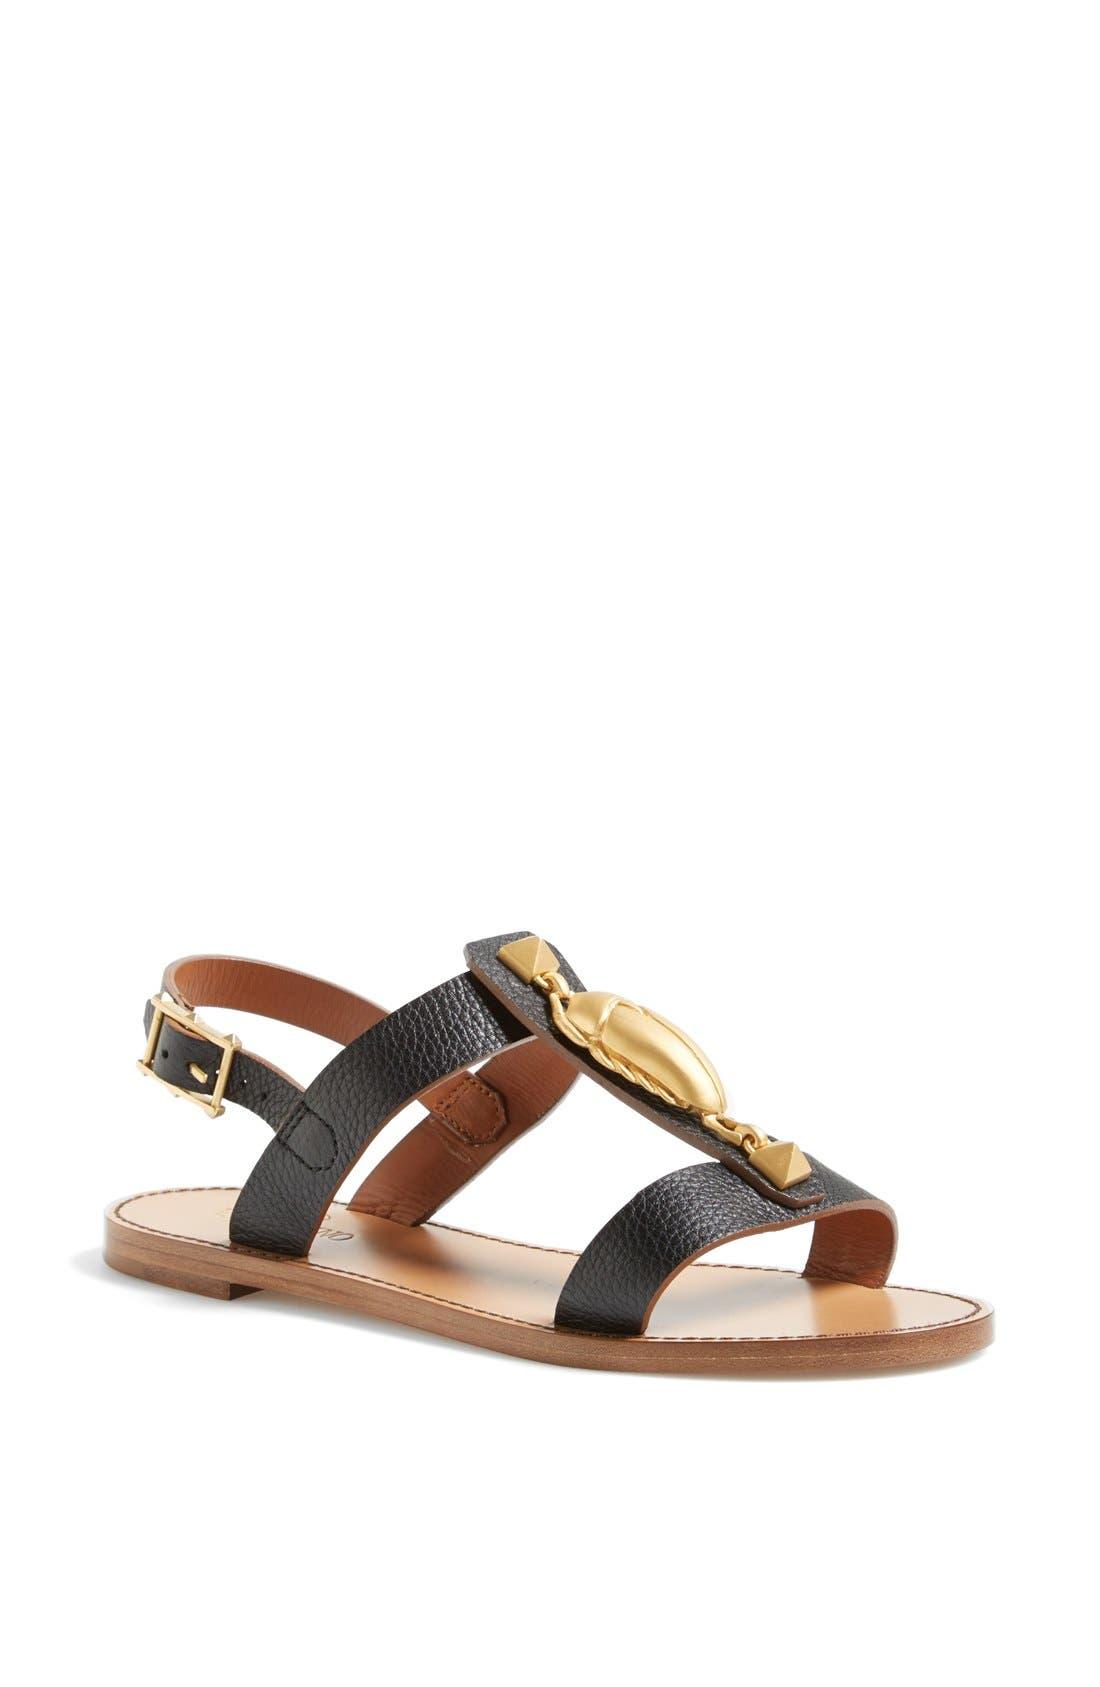 Alternate Image 1 Selected - VALENTINO GARAVANI 'Scarab' Sandal